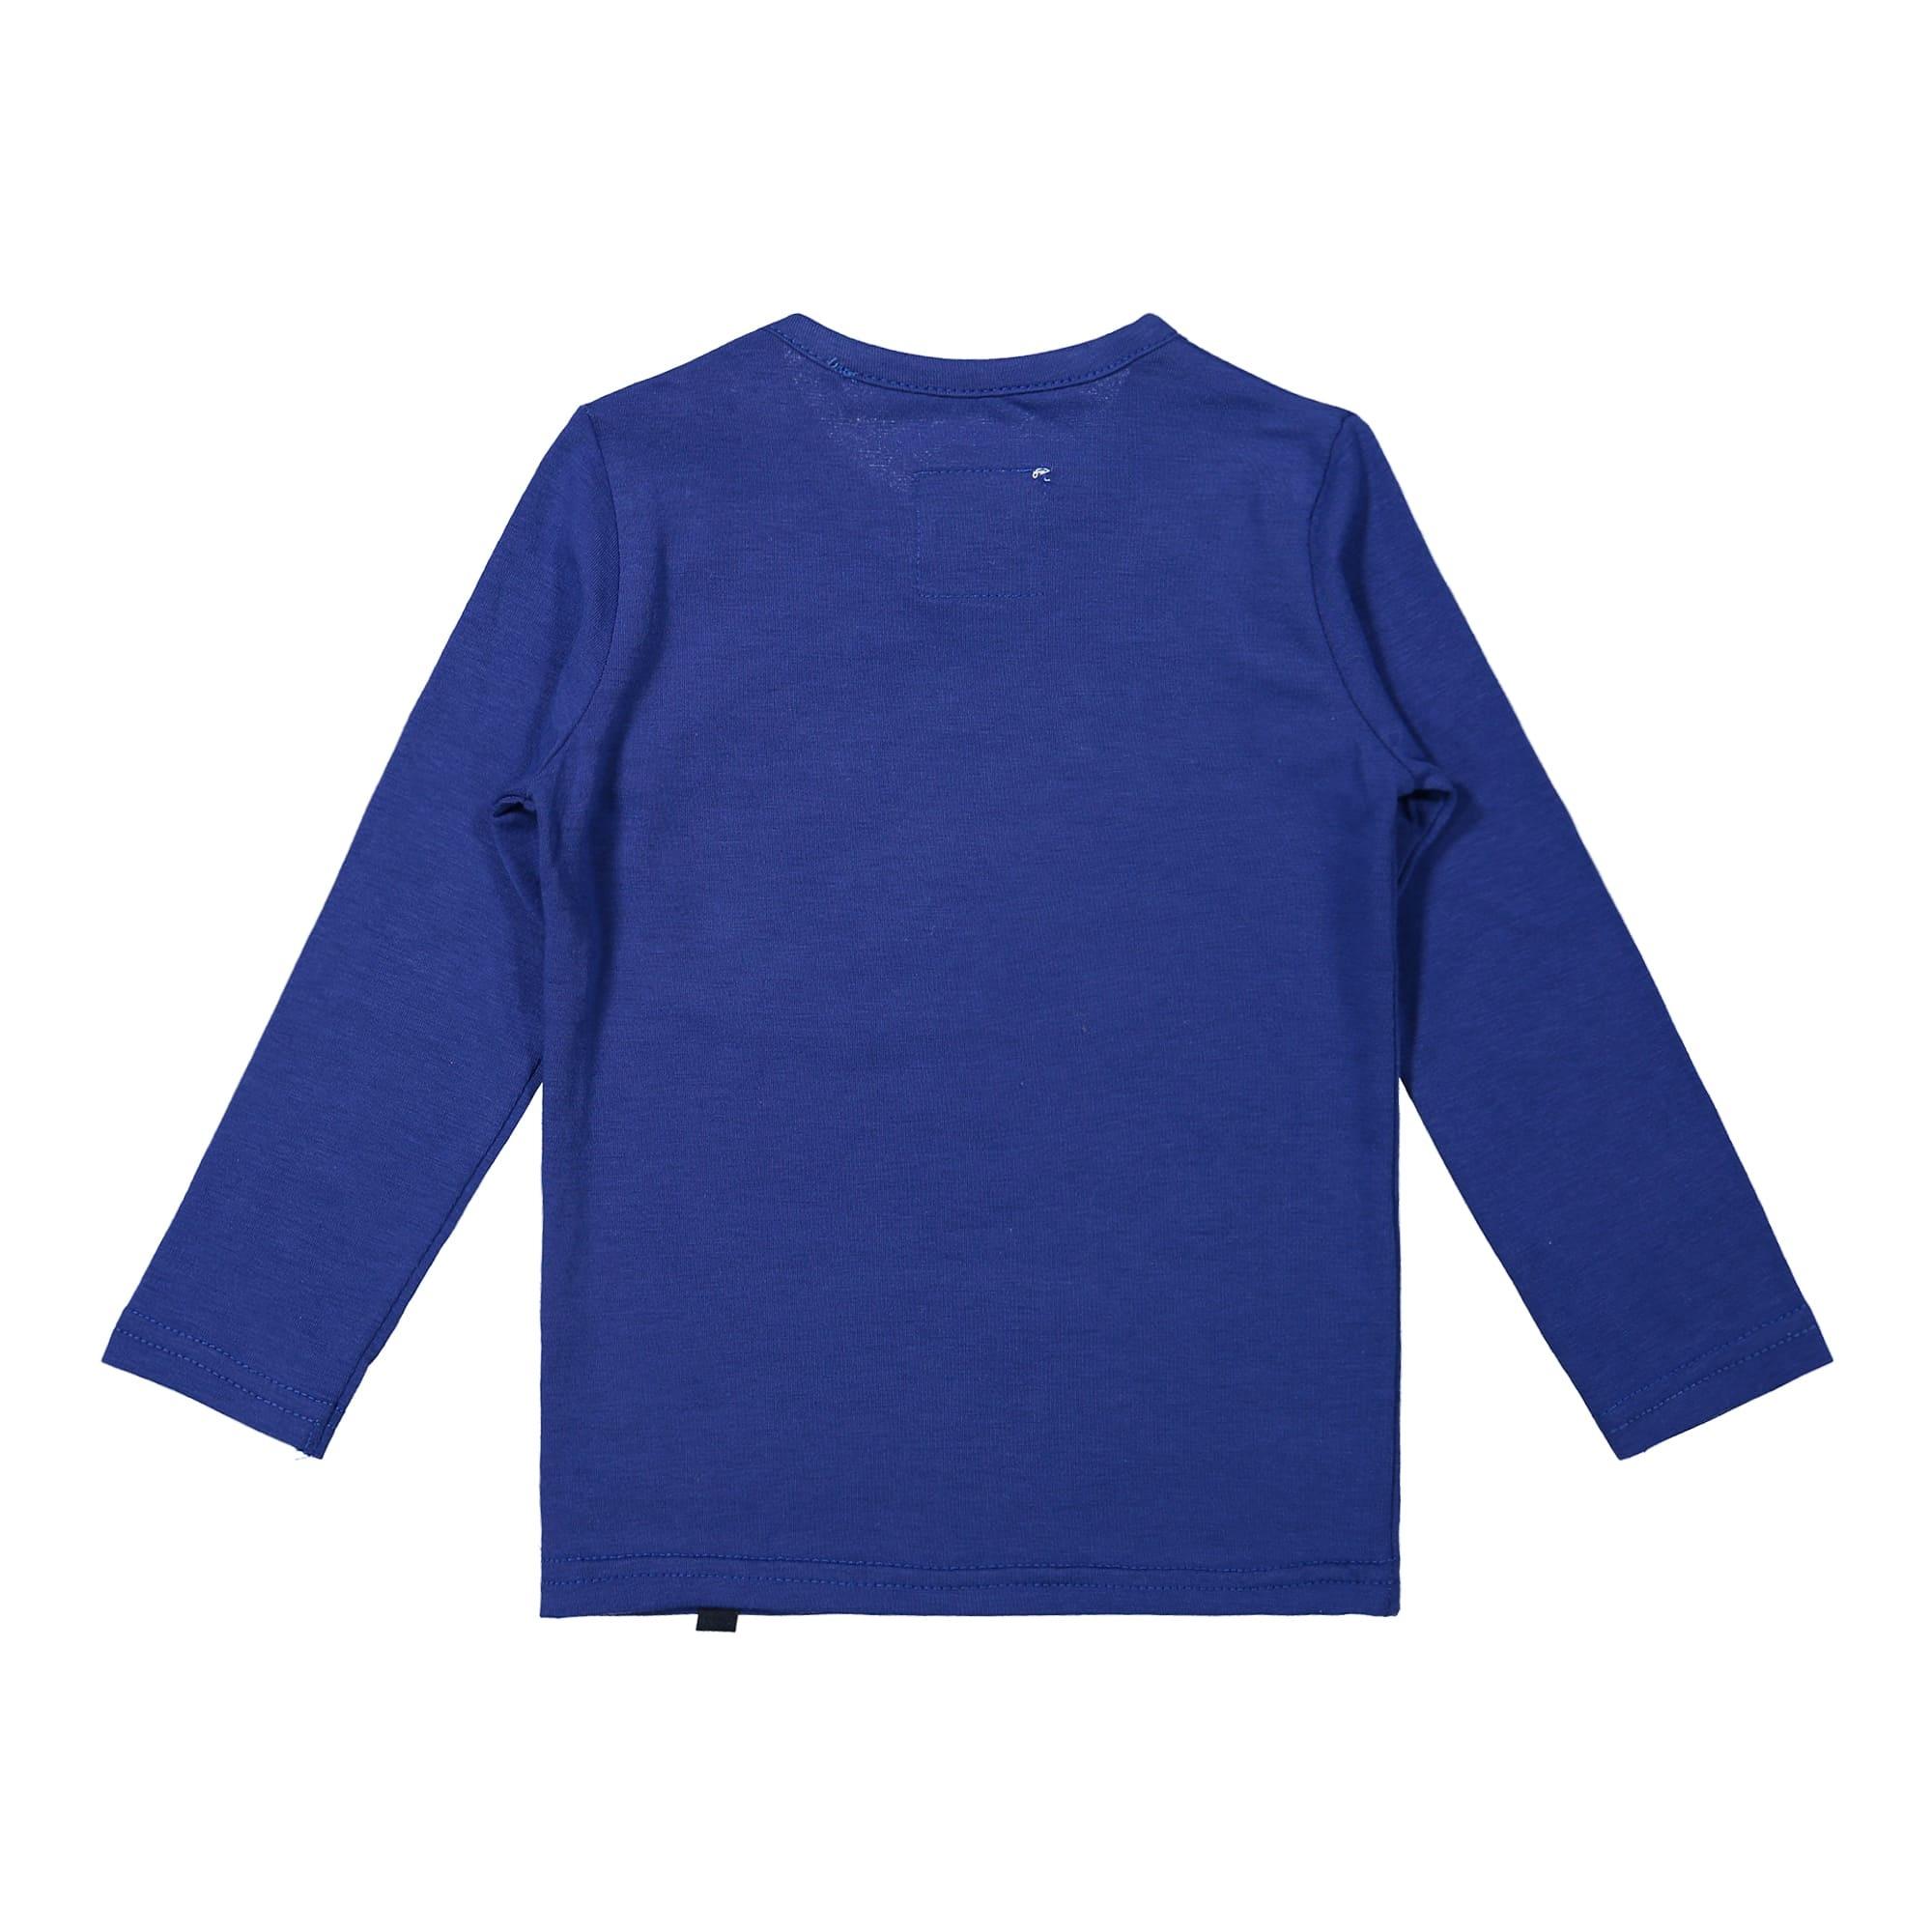 Koko Noko Boys T-shirt ls - F40834-37